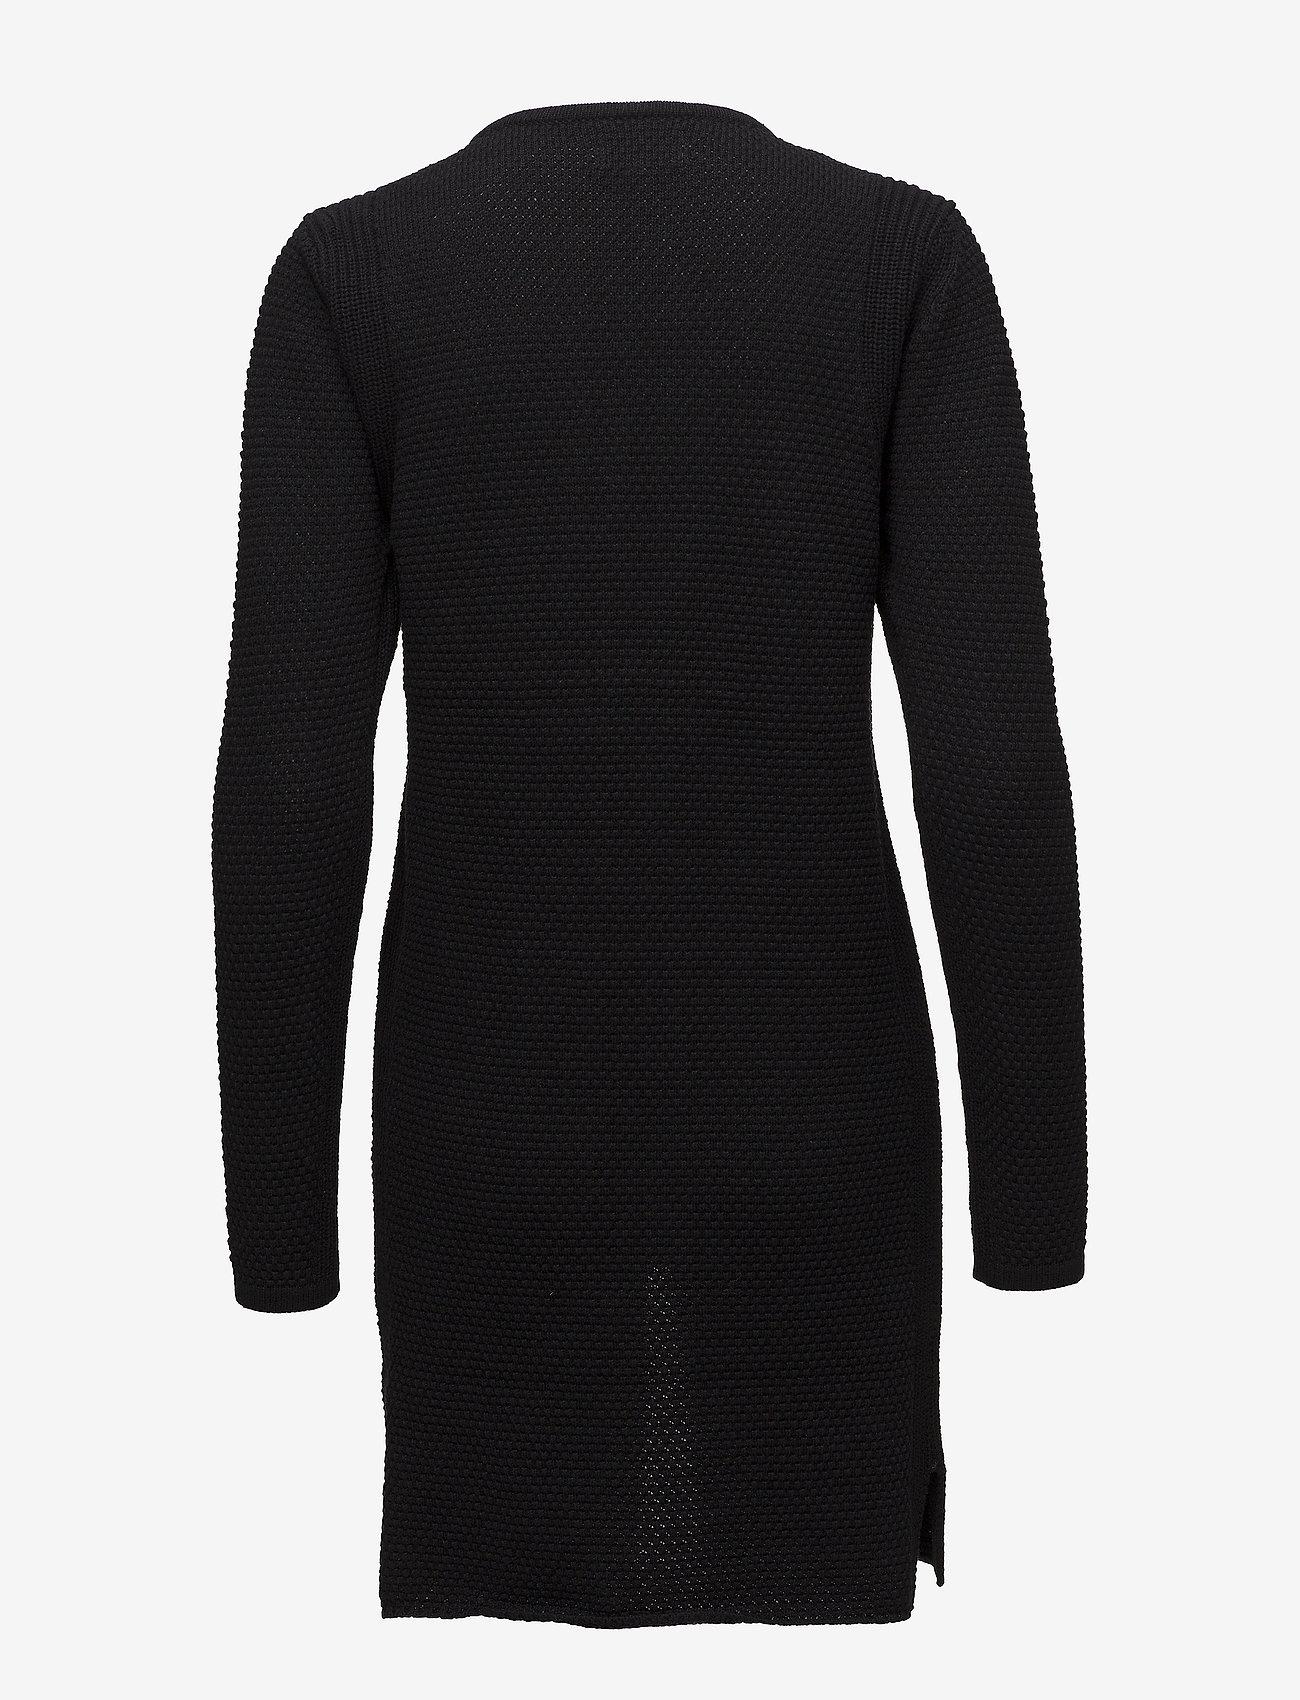 Minus - Vibe cardigan - cardigans - black - 1